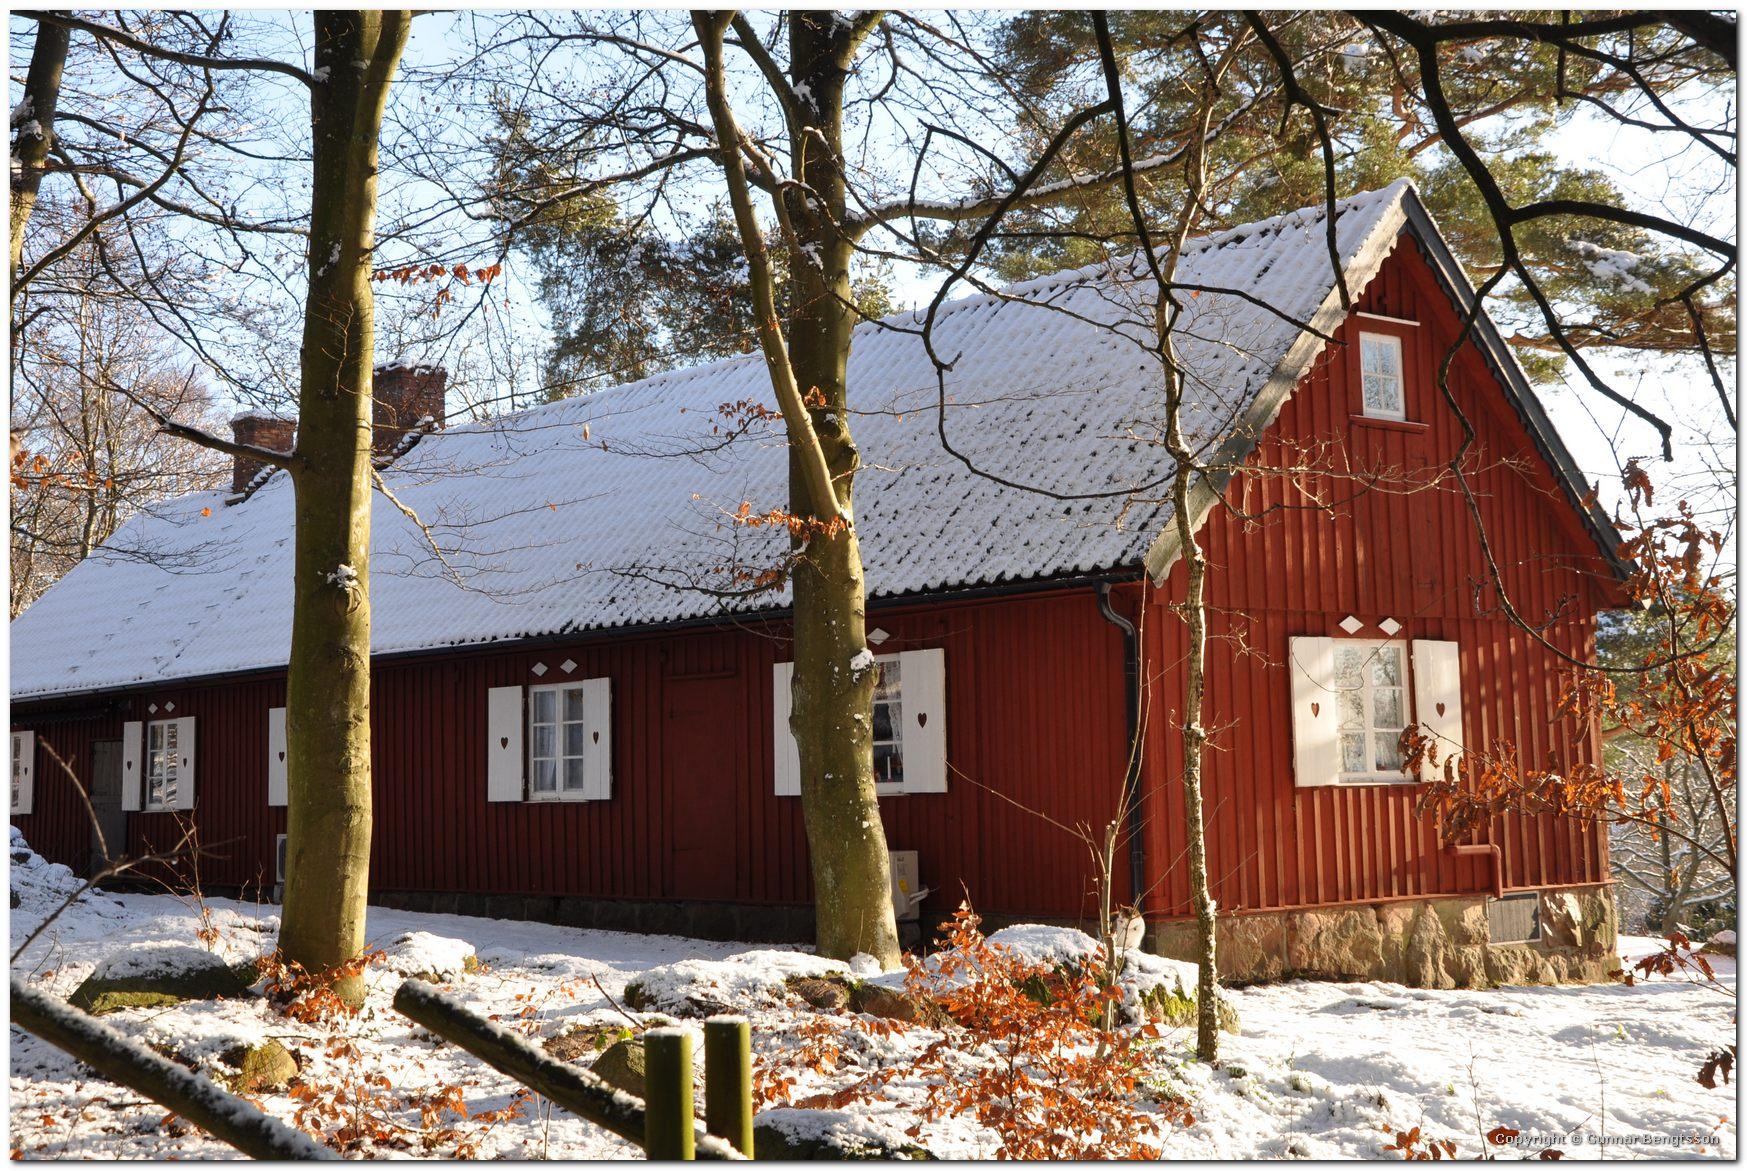 2009-12_harplinge_hembygd_12